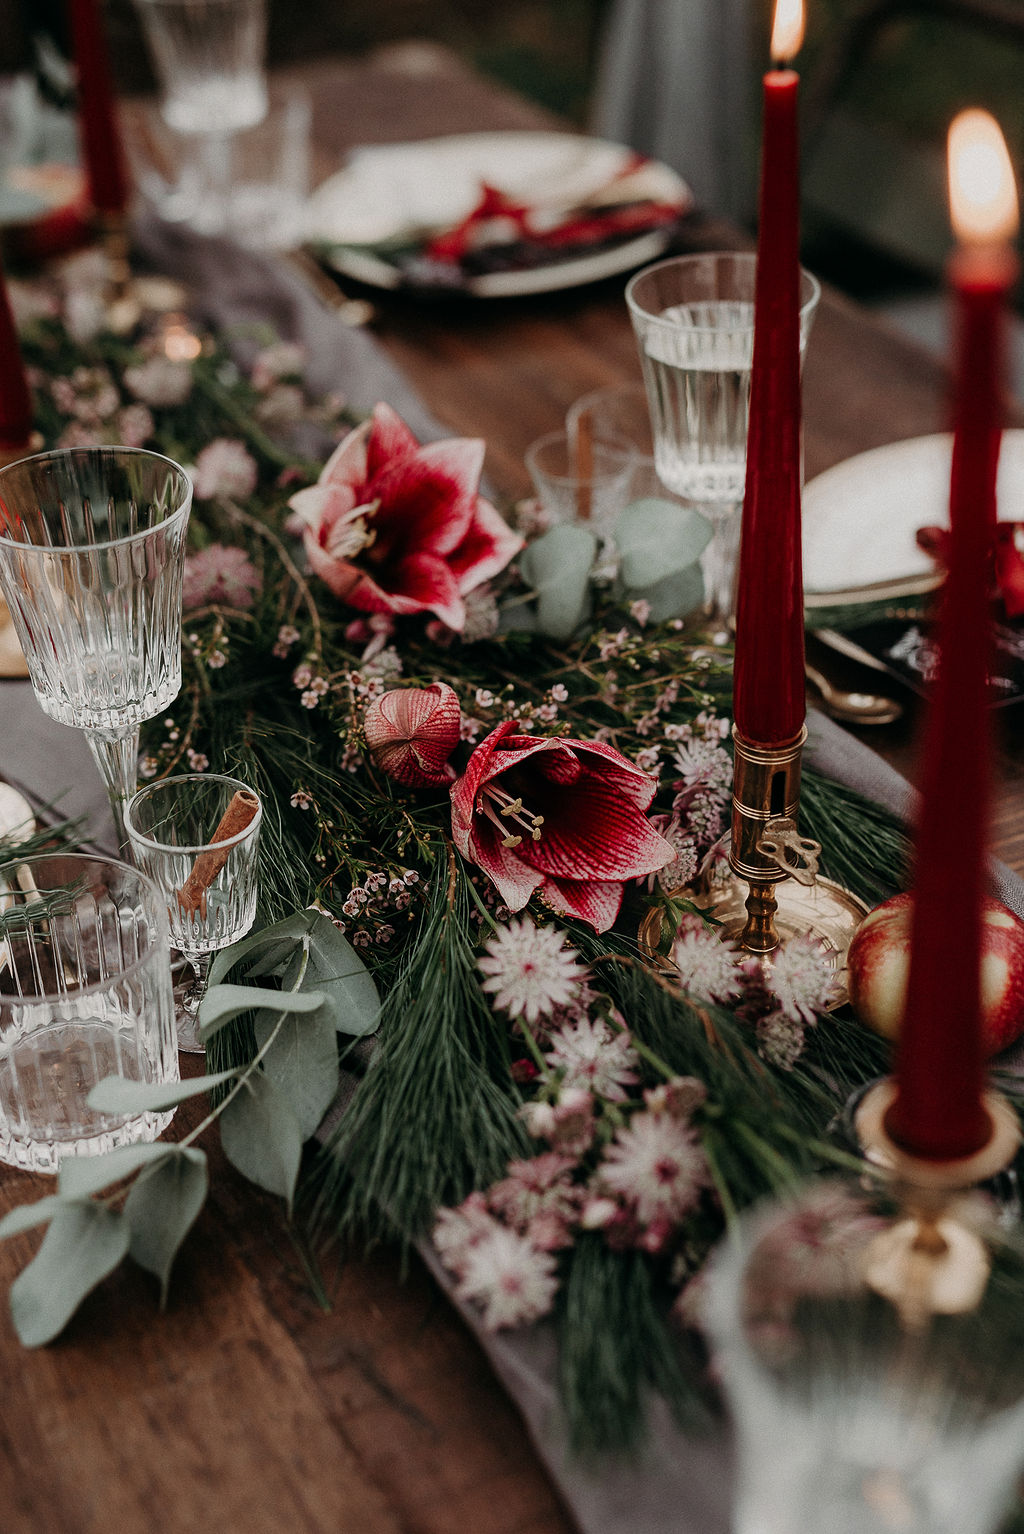 Julbröllop+vinterbröllop+dukning1.jpg